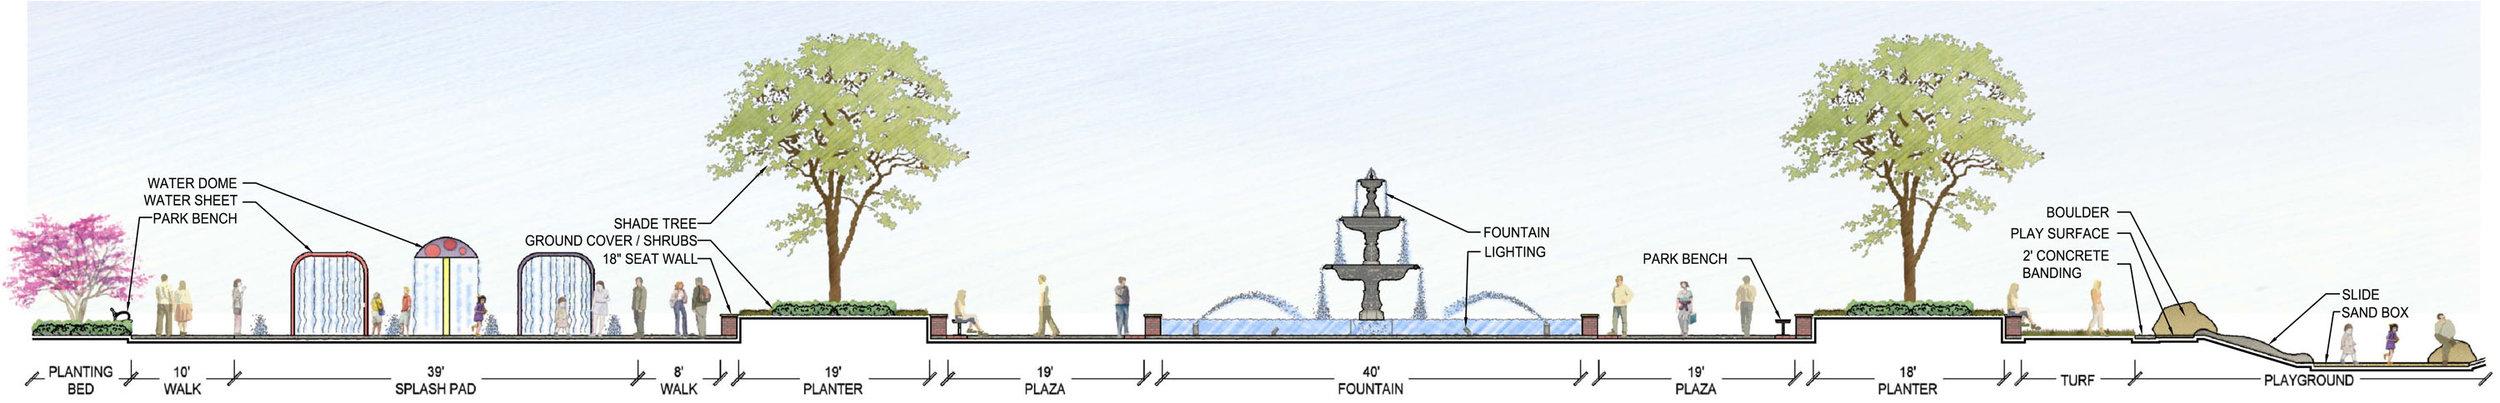 Rendering - Section View 2.jpg